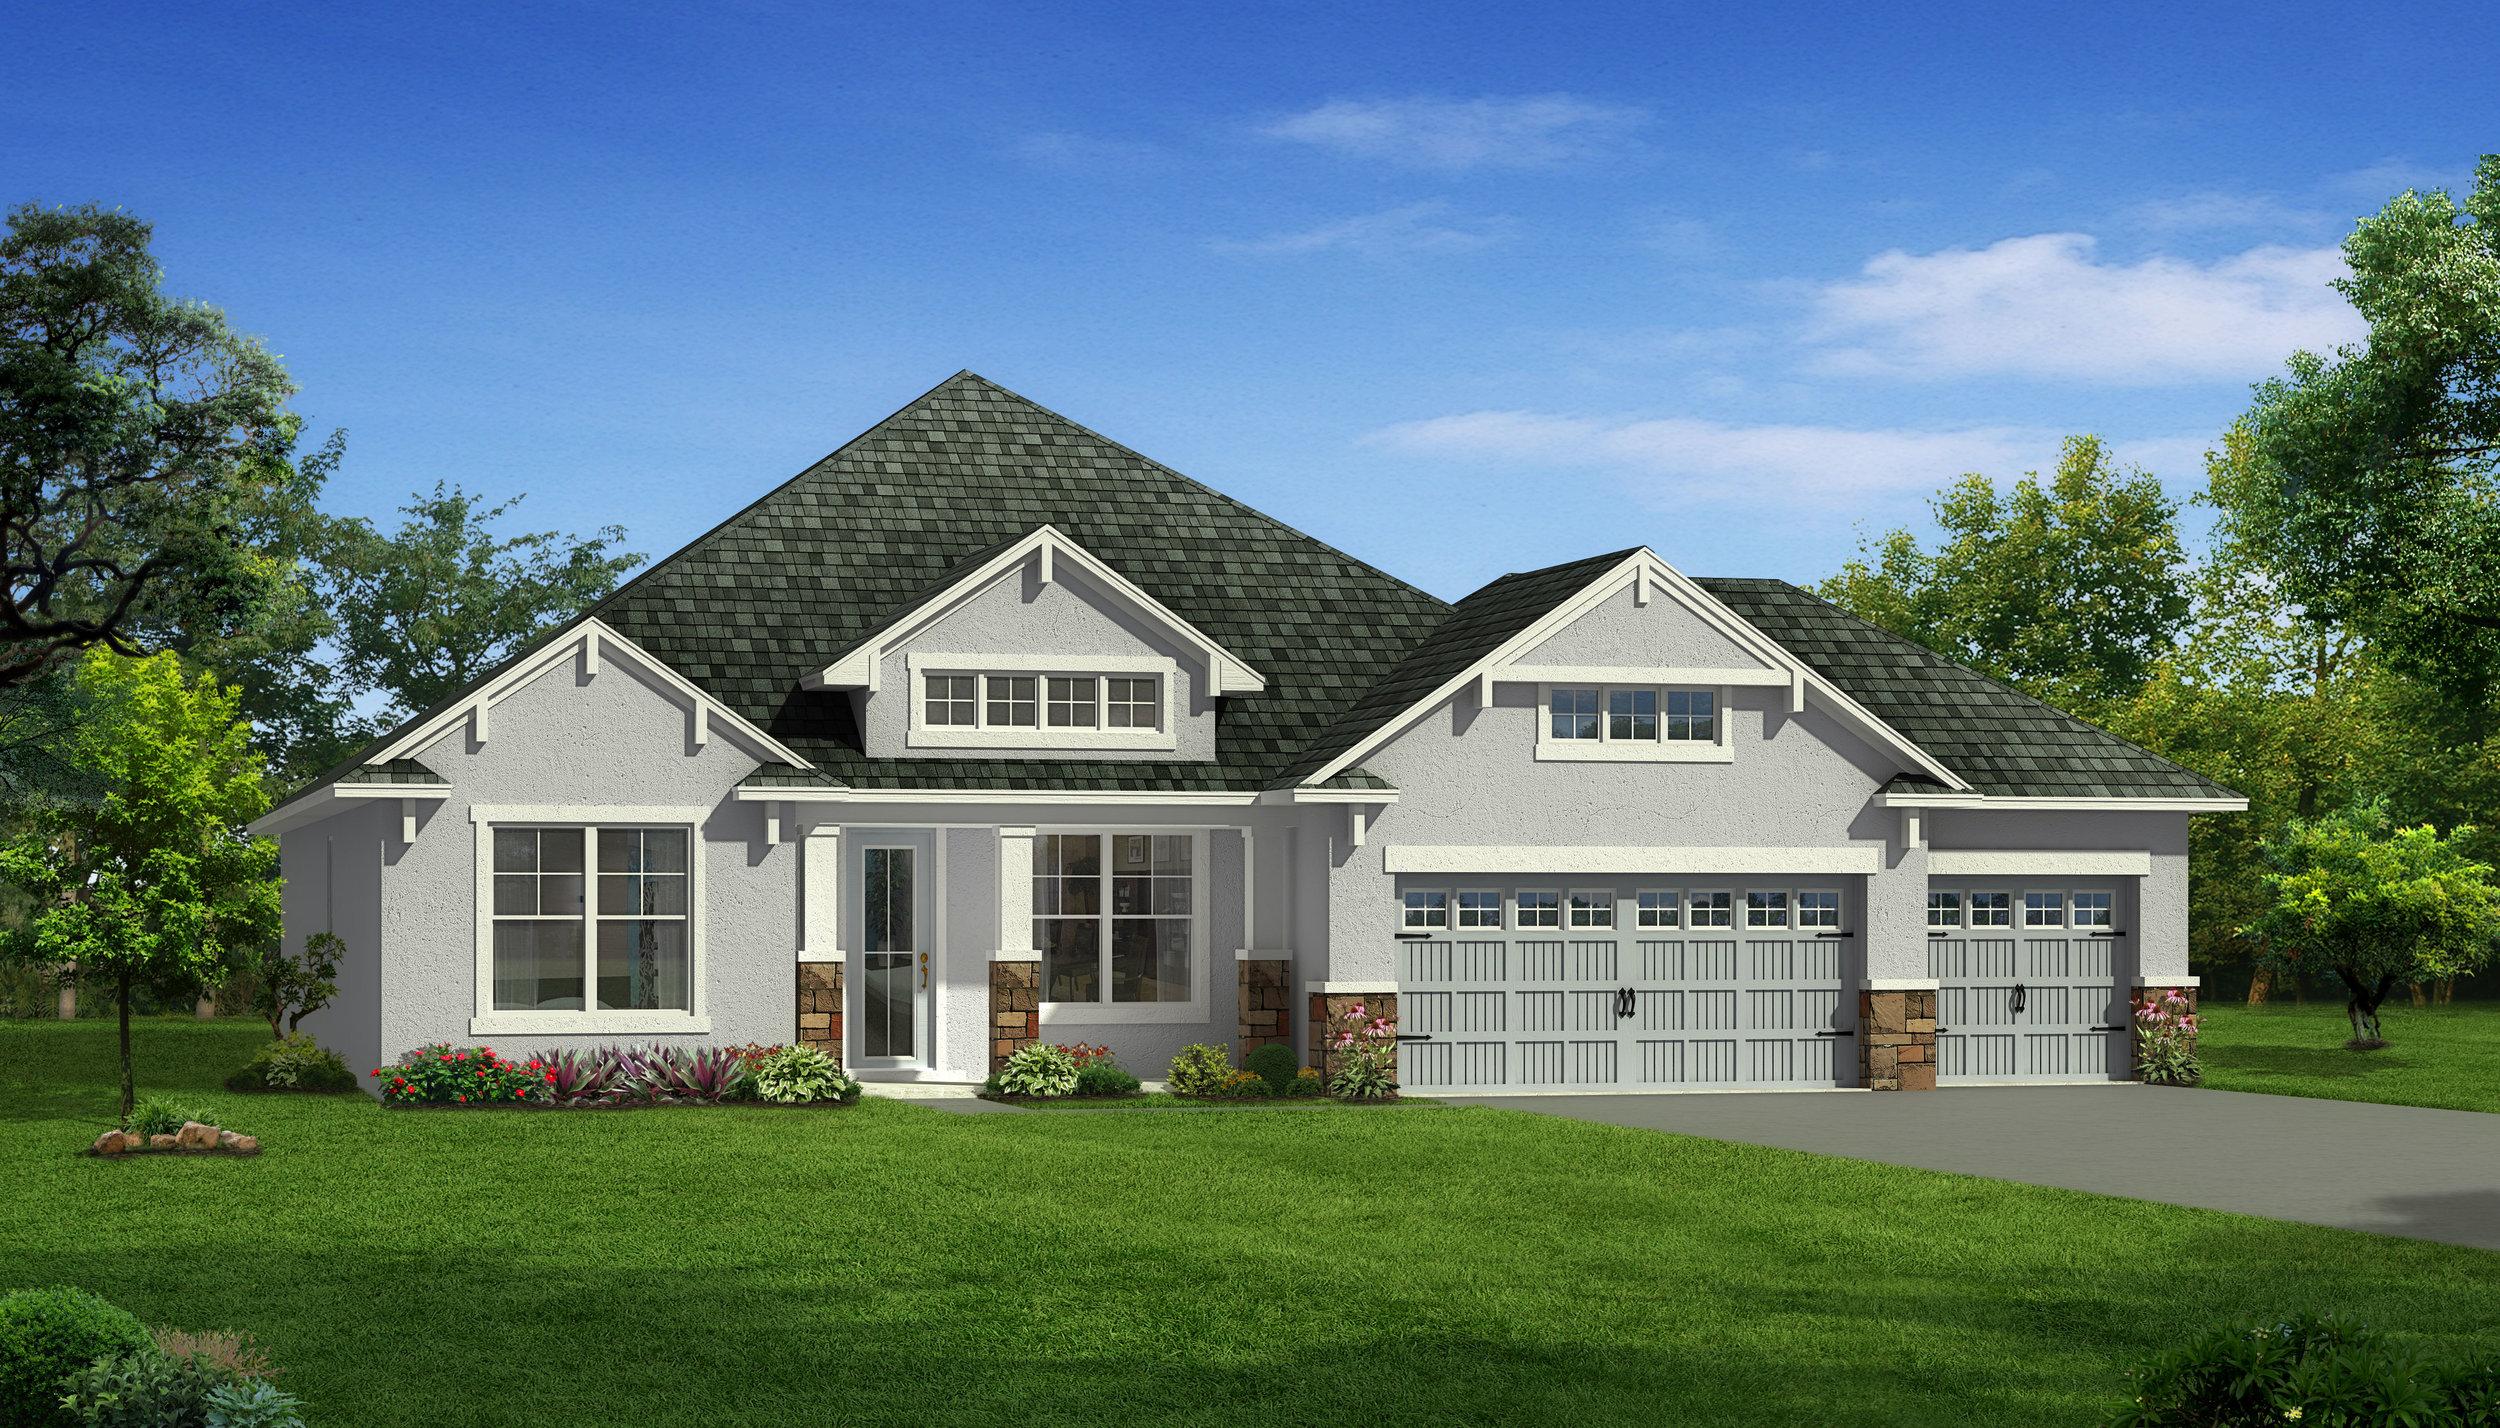 Bethany Floor Plan Home Builder Boone County Girard Homes.jpg